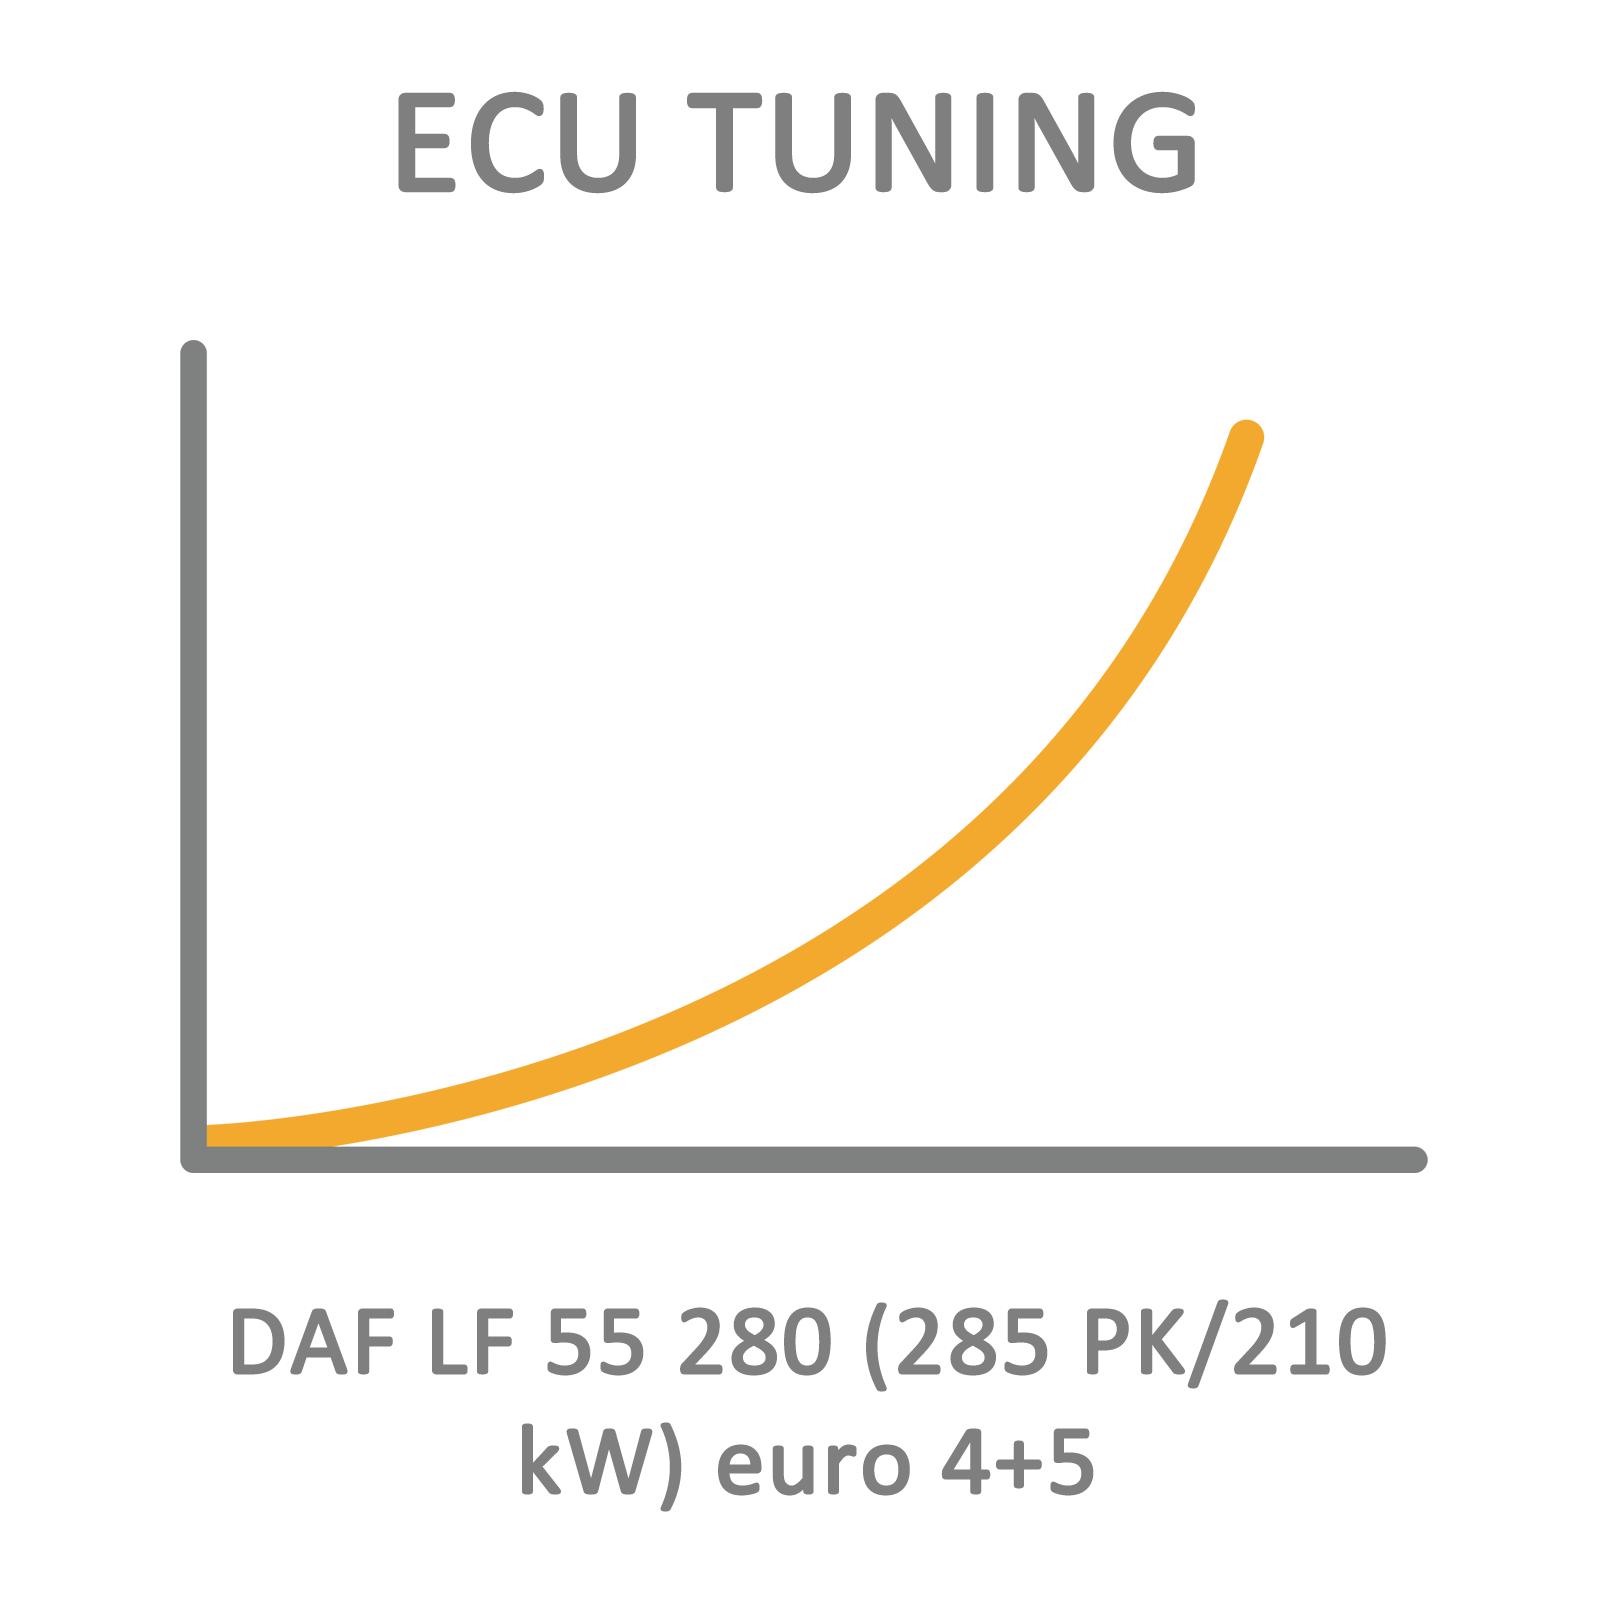 DAF LF 55 280 (285 PK/210 kW) euro 4+5 ECU Tuning